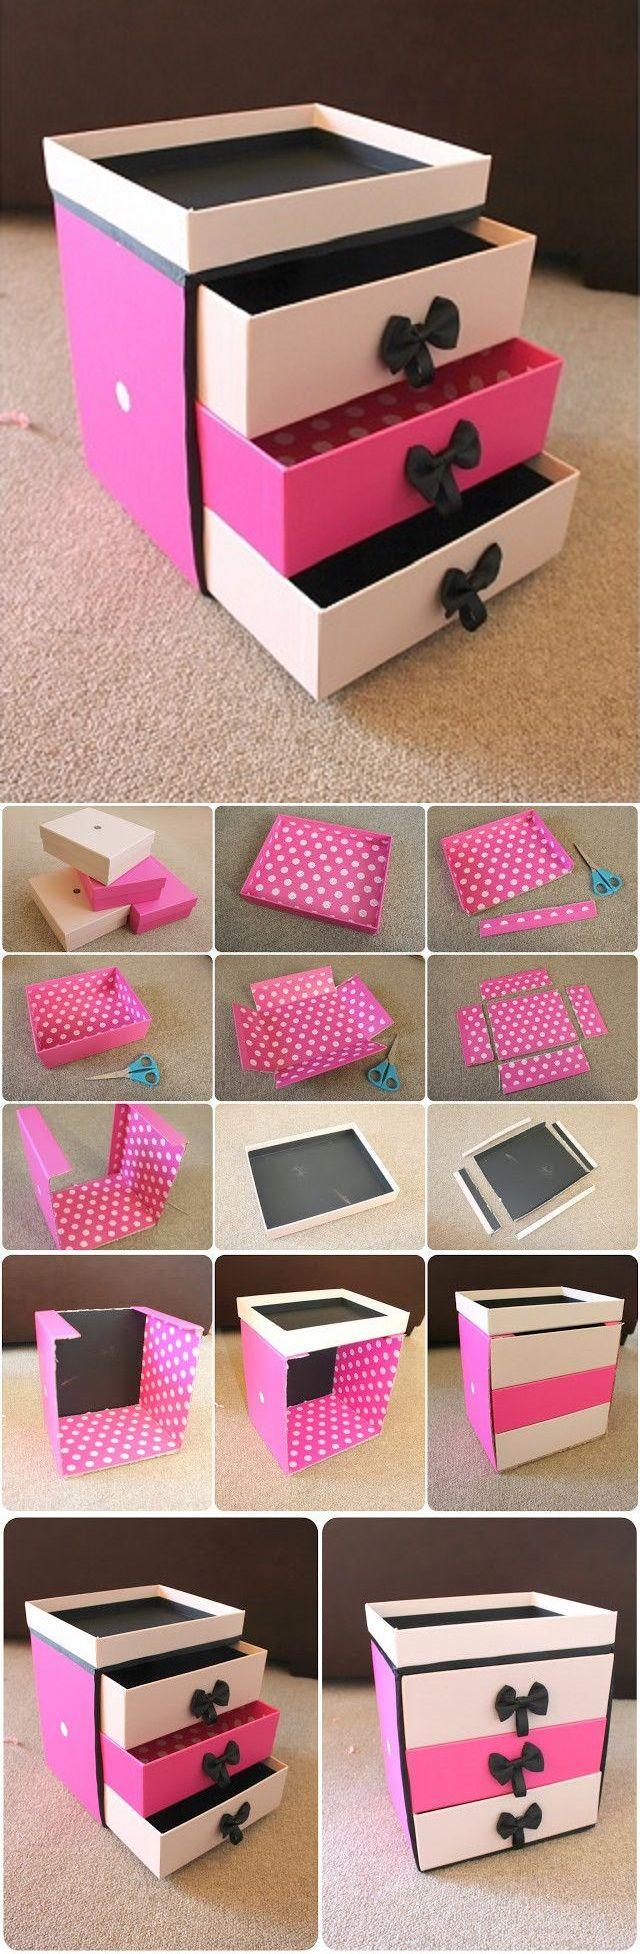 Make up storage diy gifts pinterest diy storage diy and